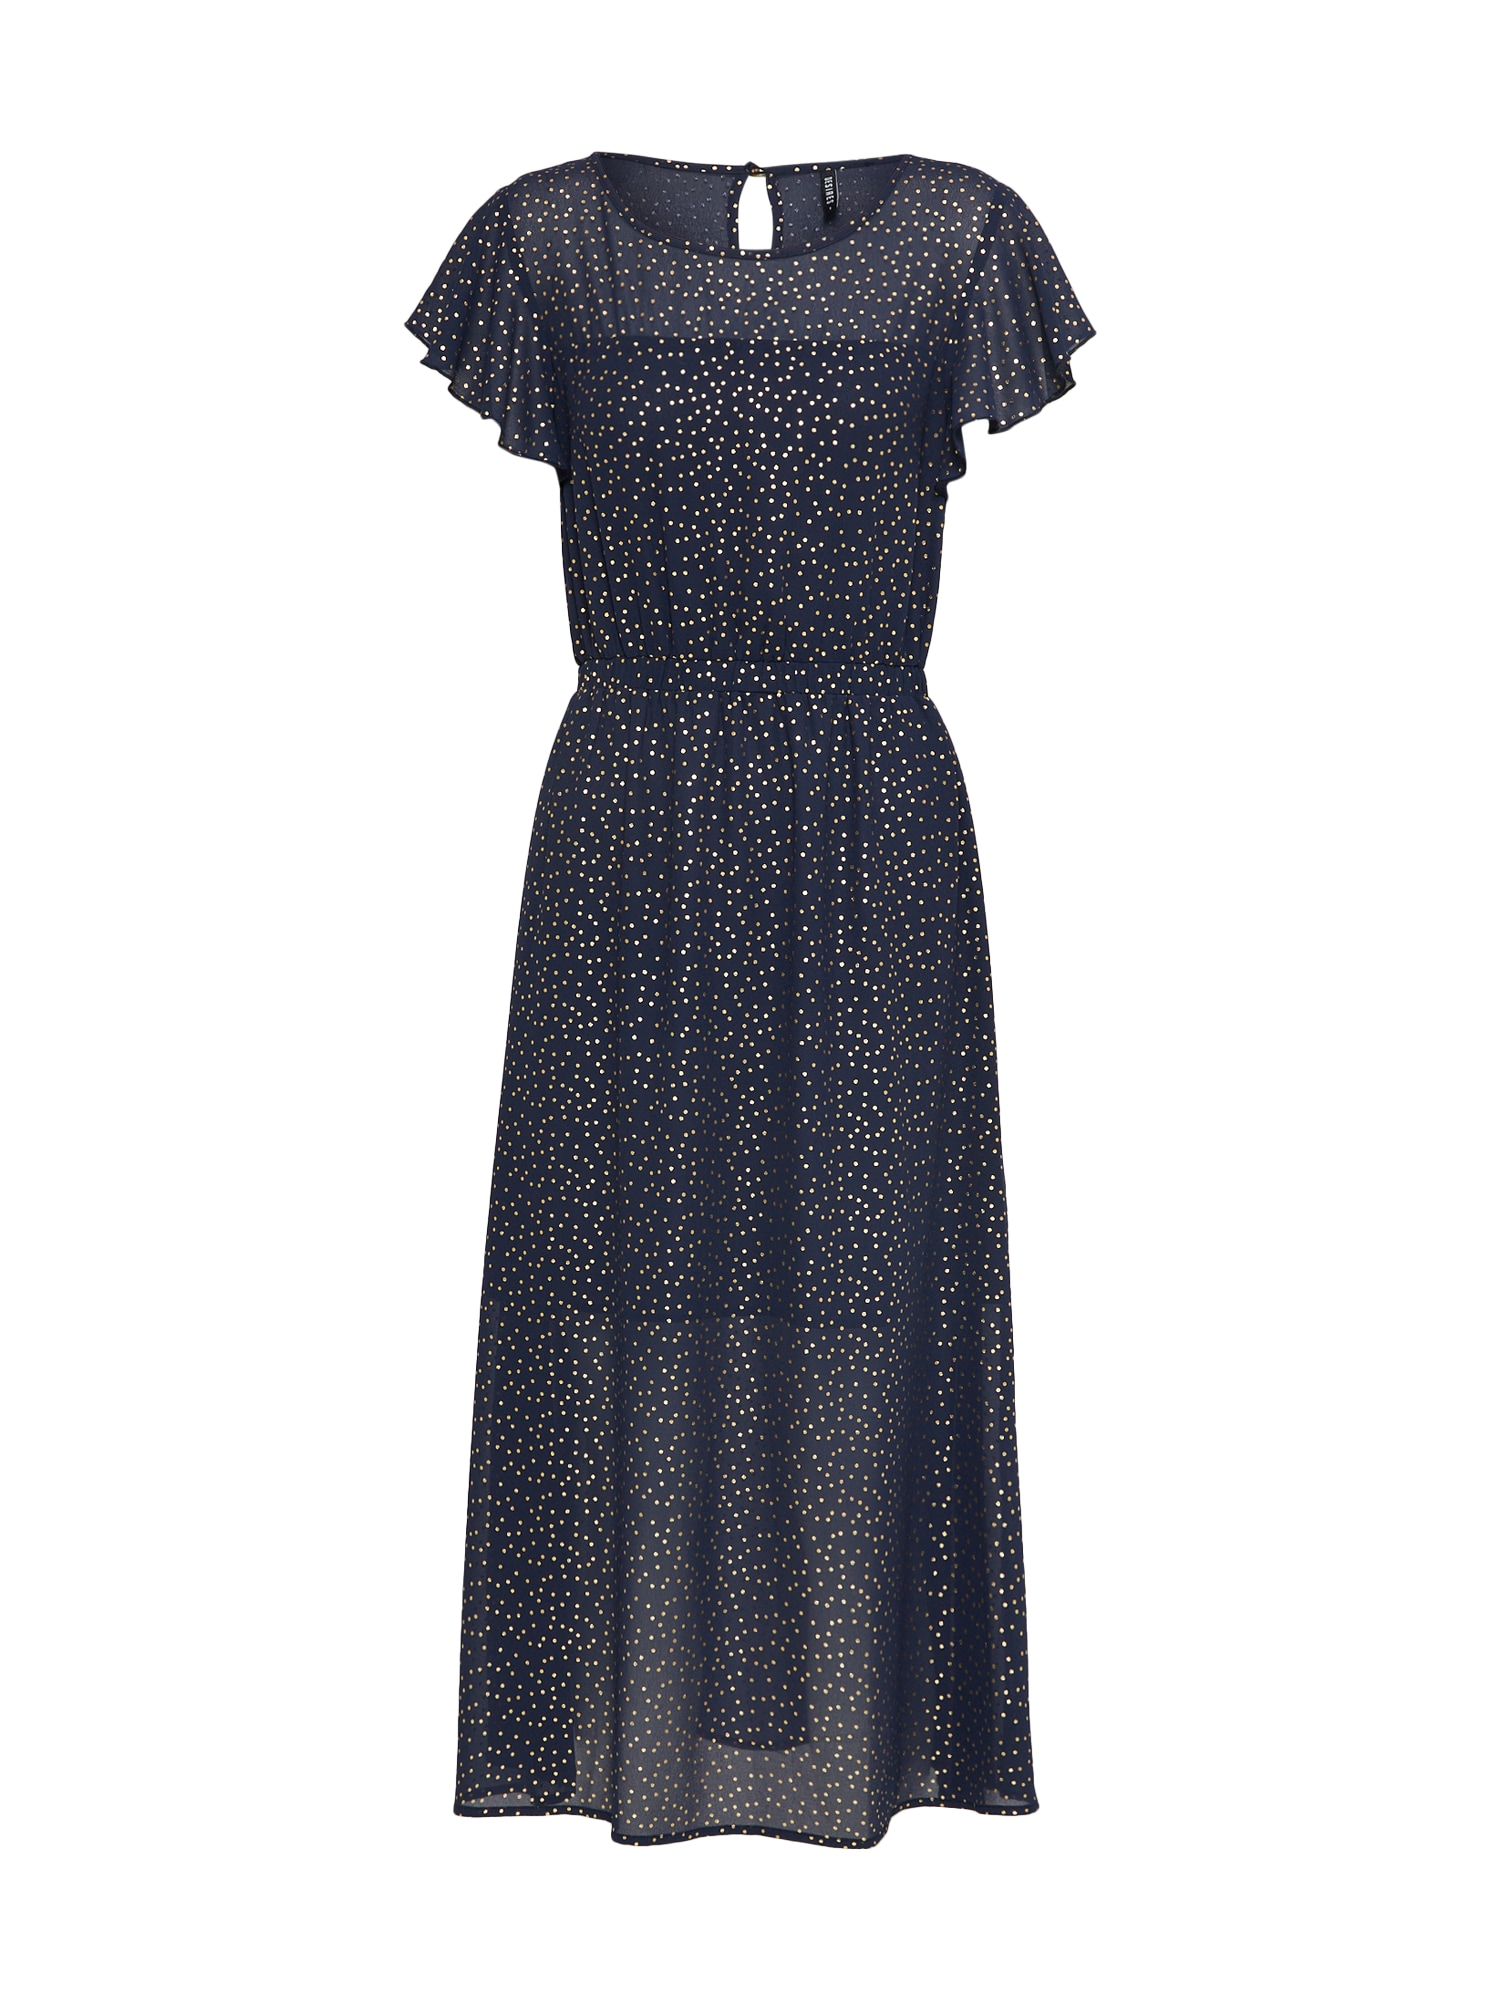 Šaty Tomelise 2 modrá Desires